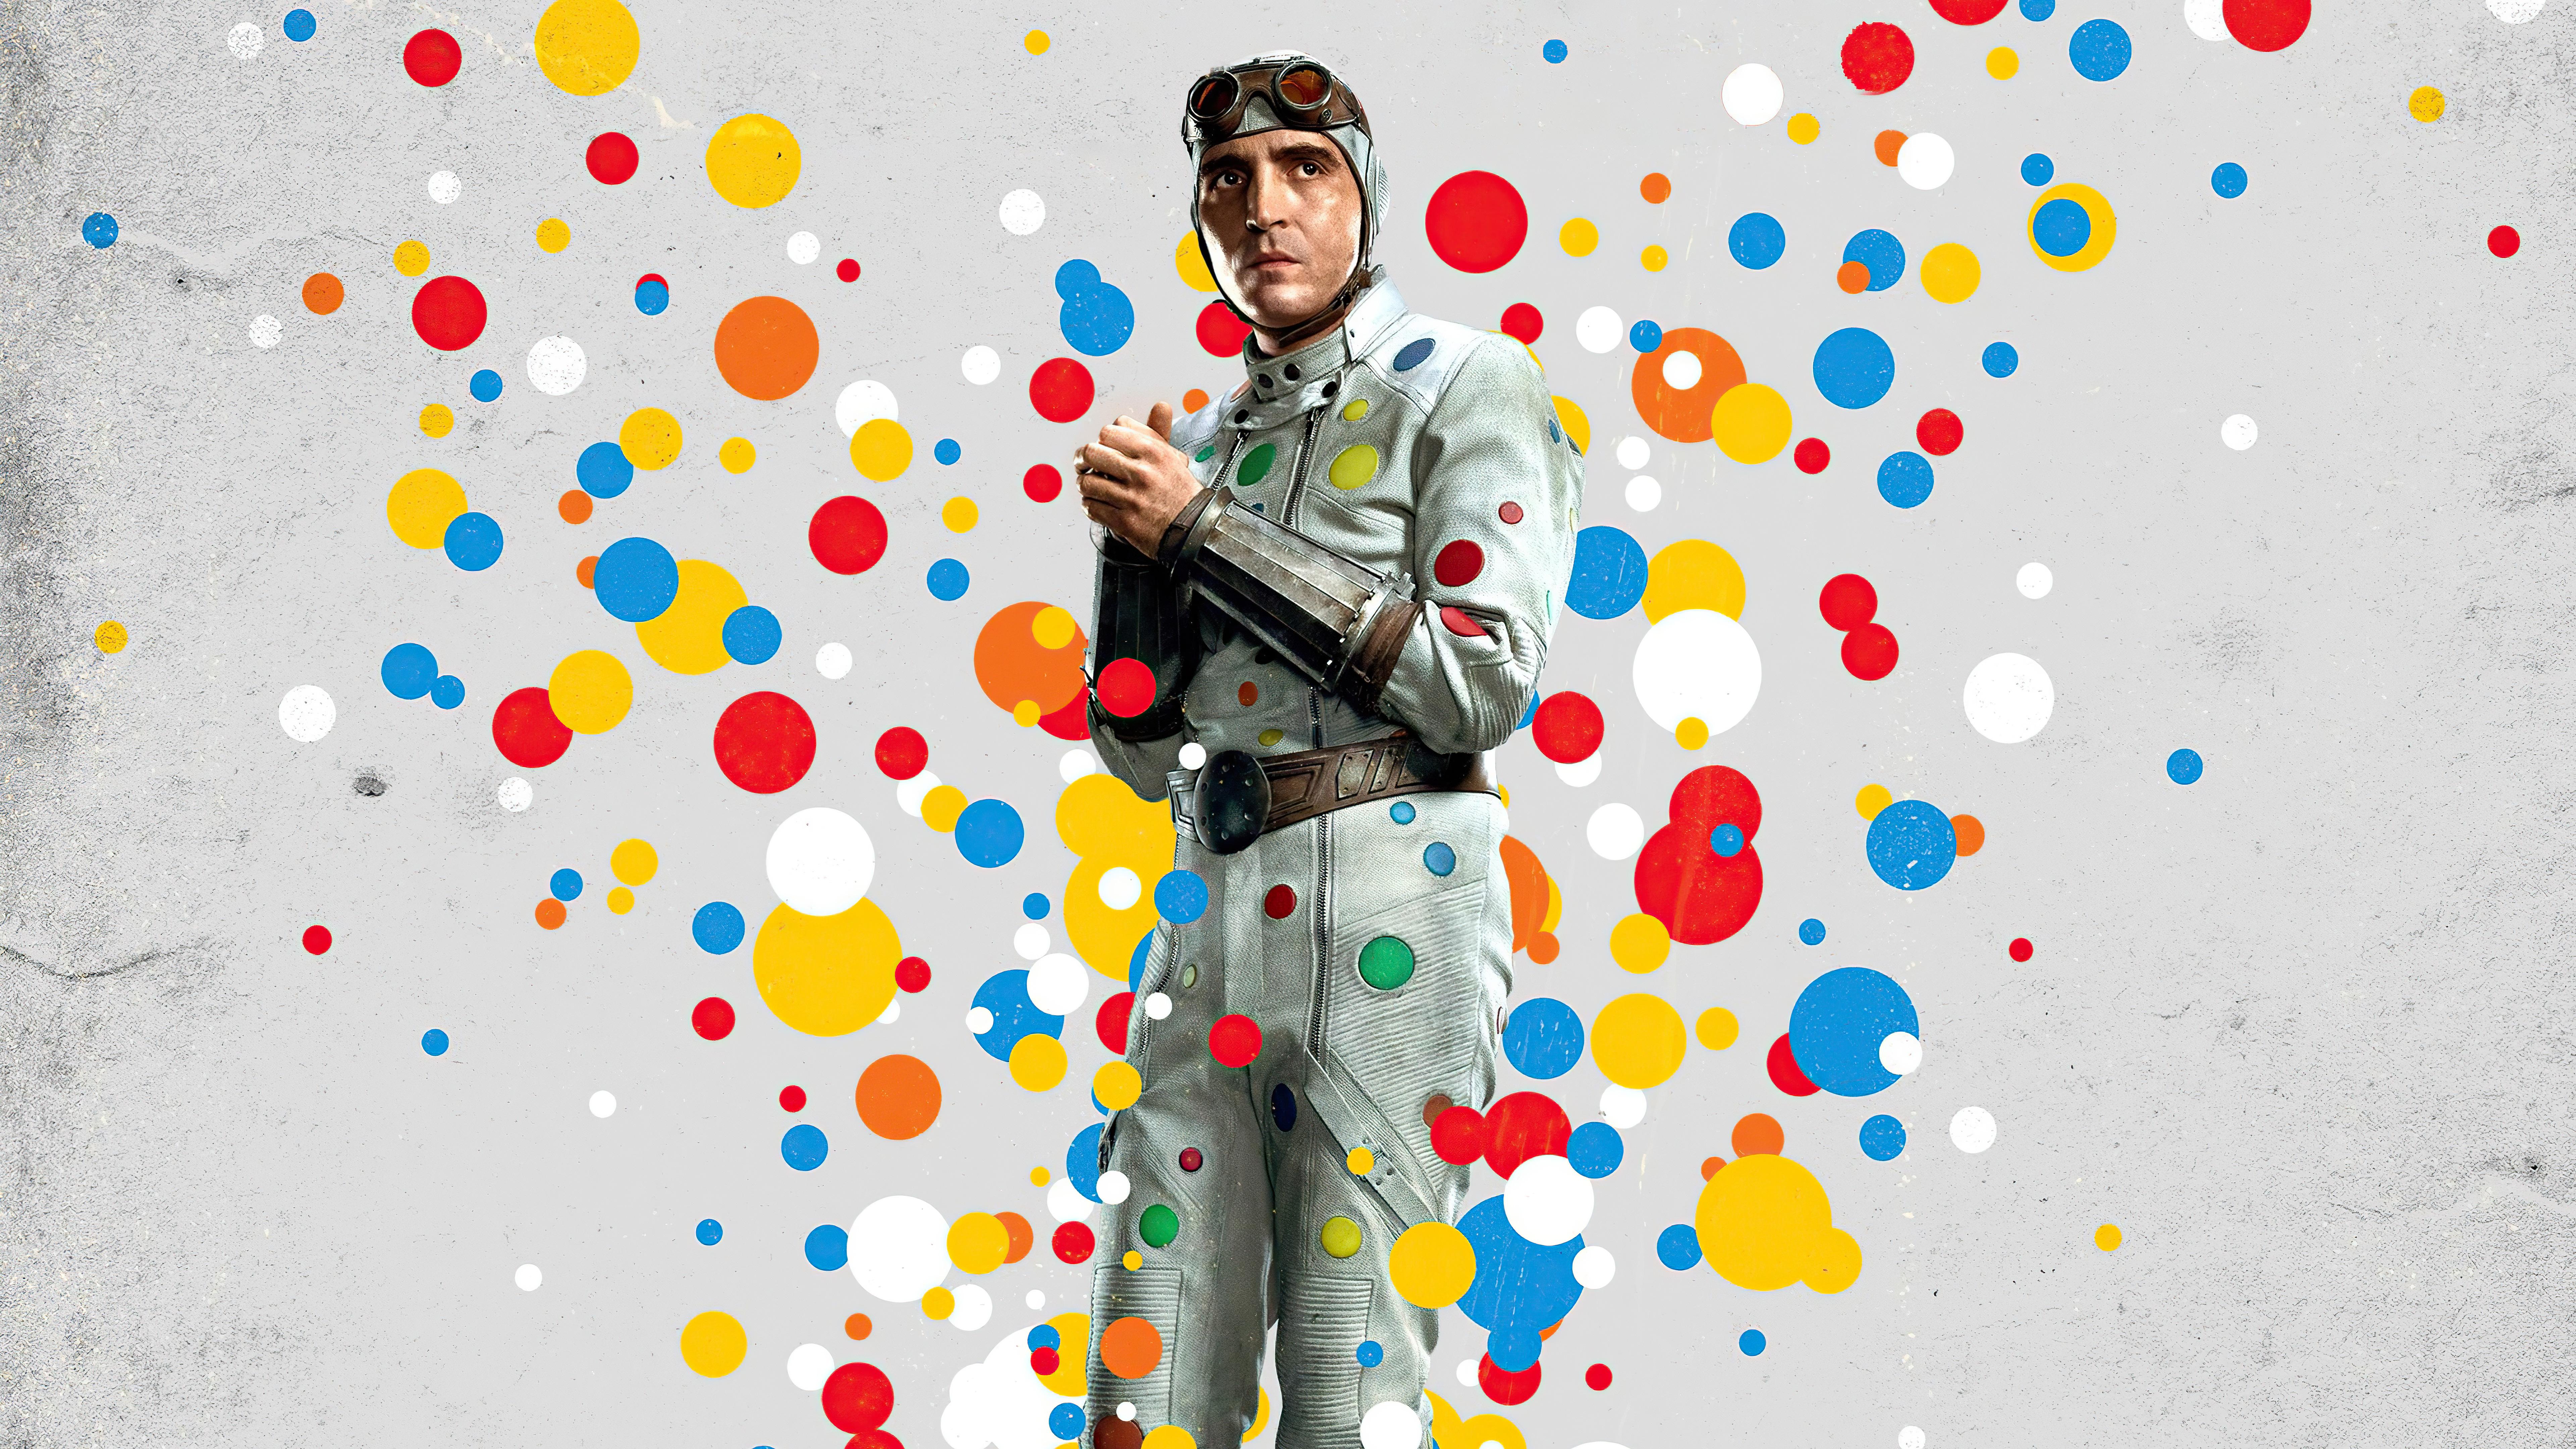 polka dot man the suicide squad 4k 1618167509 - Polka Dot Man The Suicide Squad 4k - Polka Dot Man The Suicide Squad 4k wallpapers